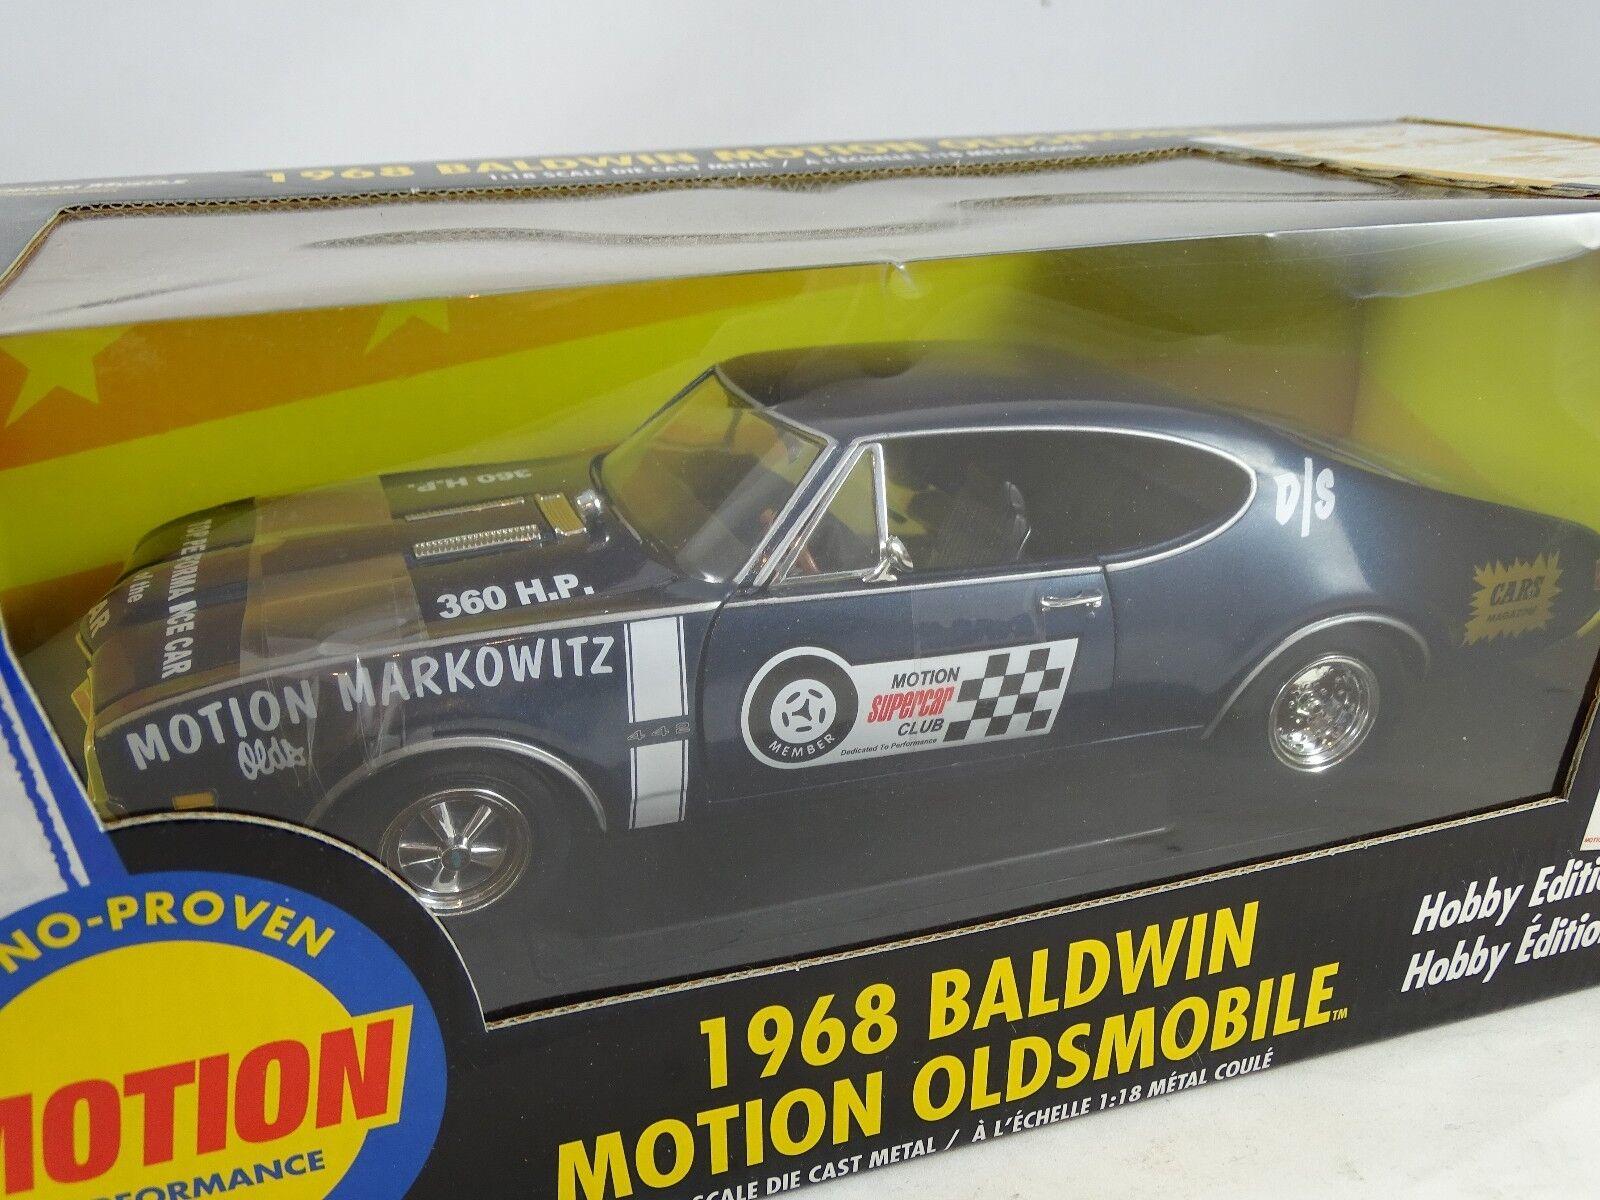 1 18 ertl  36984 36984 36984 1968 Baldwin Motion oldsmobile hobby EDT. rareza § 30ee9d